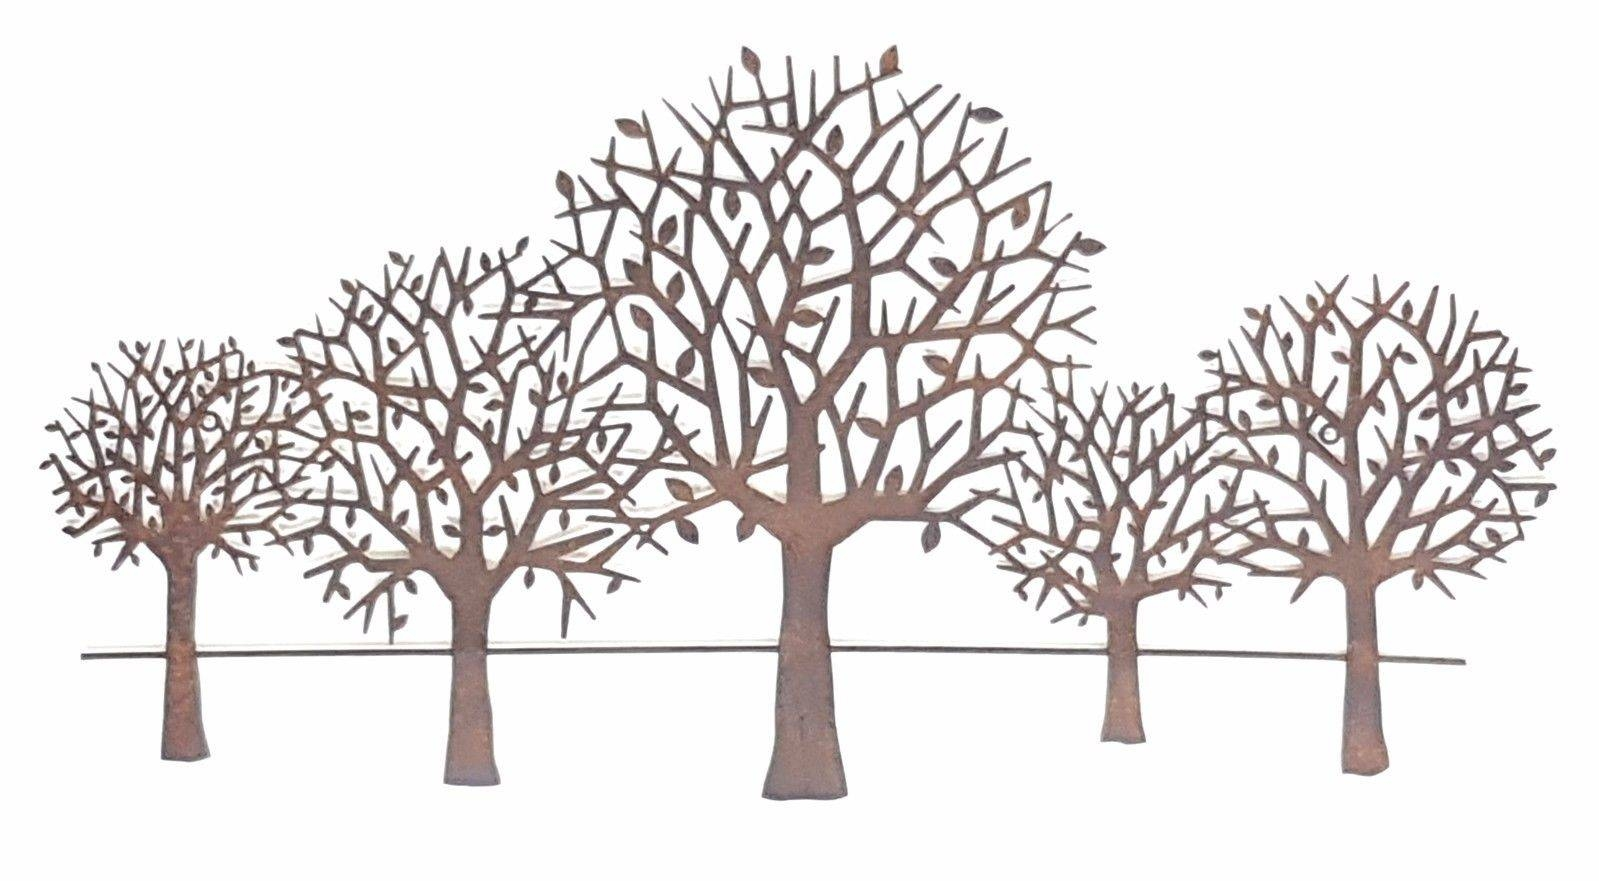 Wall Art Designs: Metal Wall Art Trees Wall Art Metal Tree Scenery Regarding Newest Metal Wall Art Trees And Leaves (View 18 of 20)